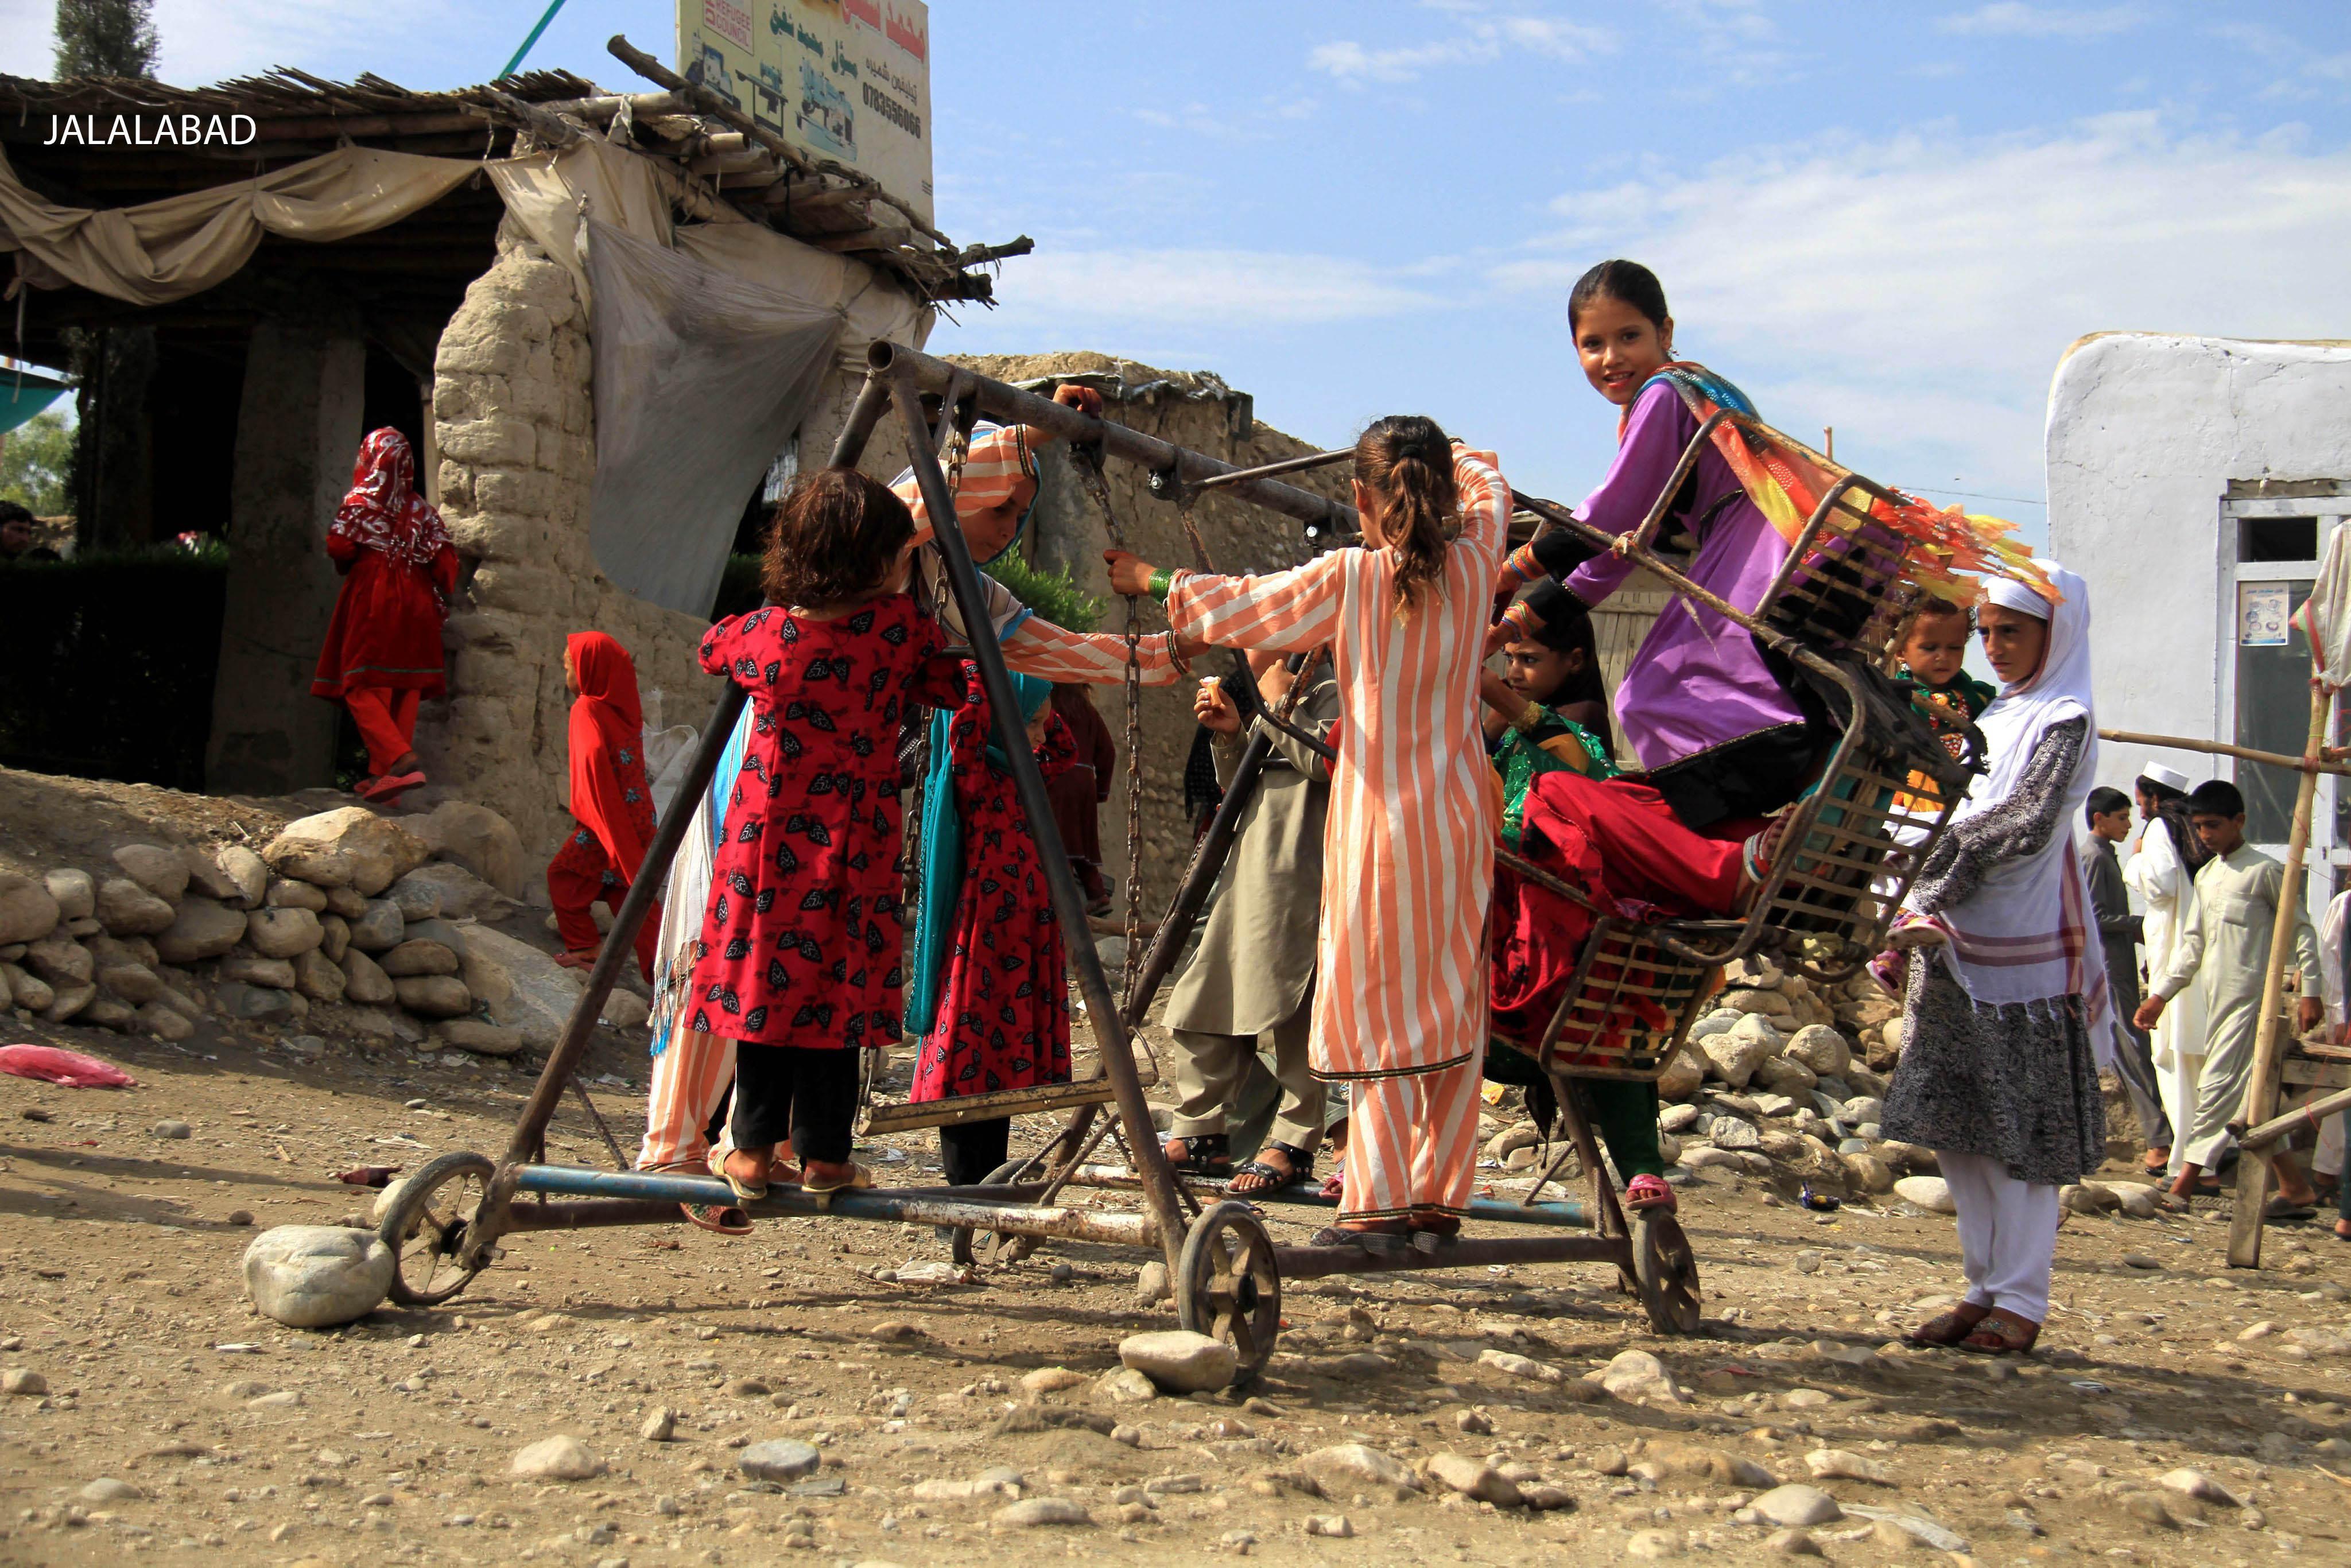 Jalalabad (Afghanistan)